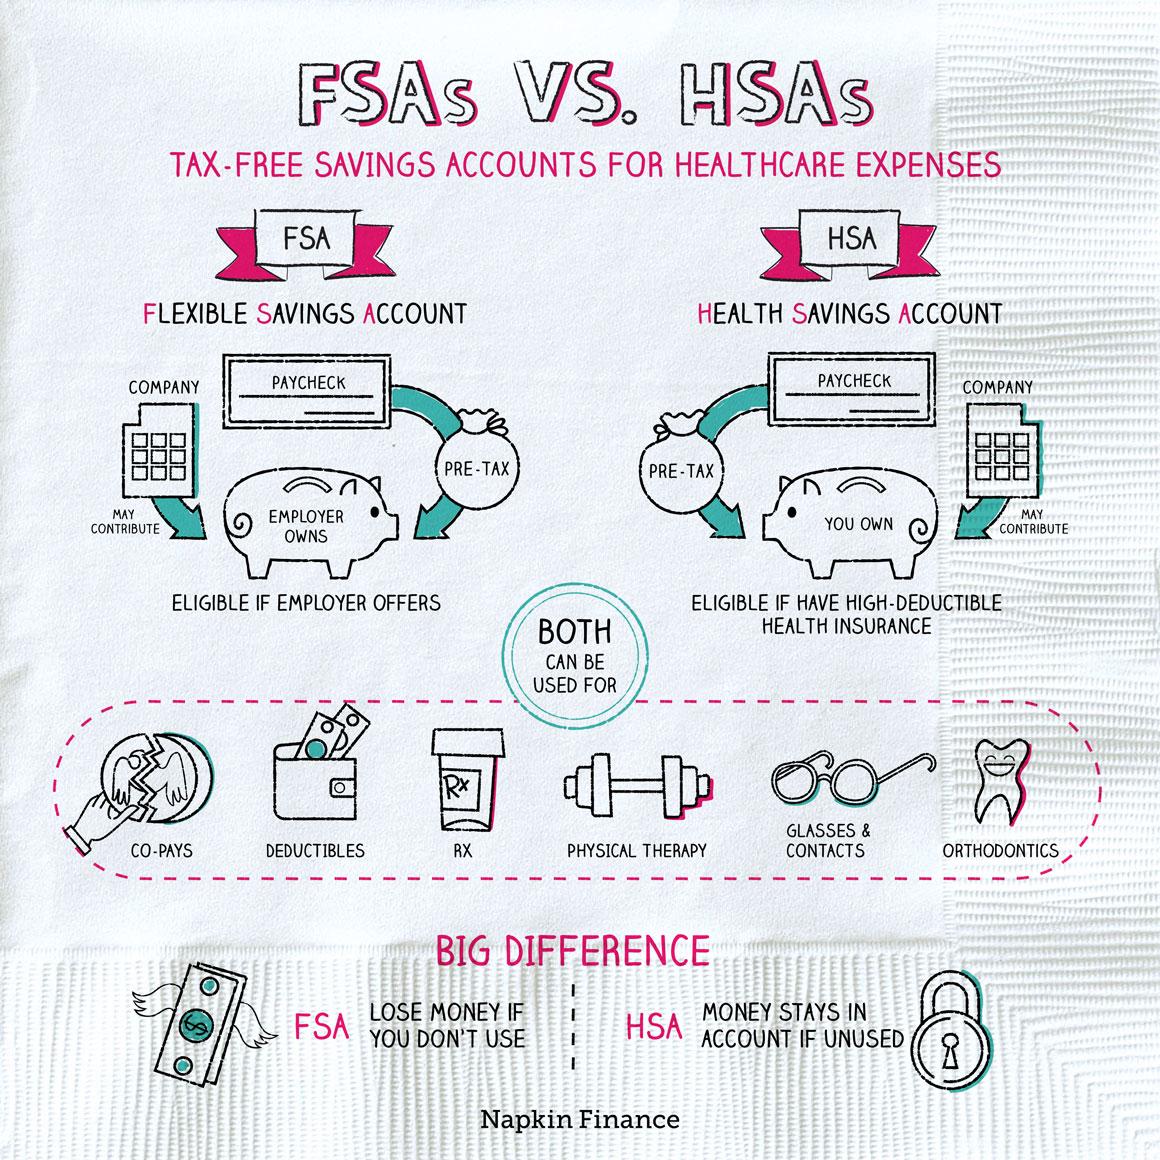 FSA vs HSA